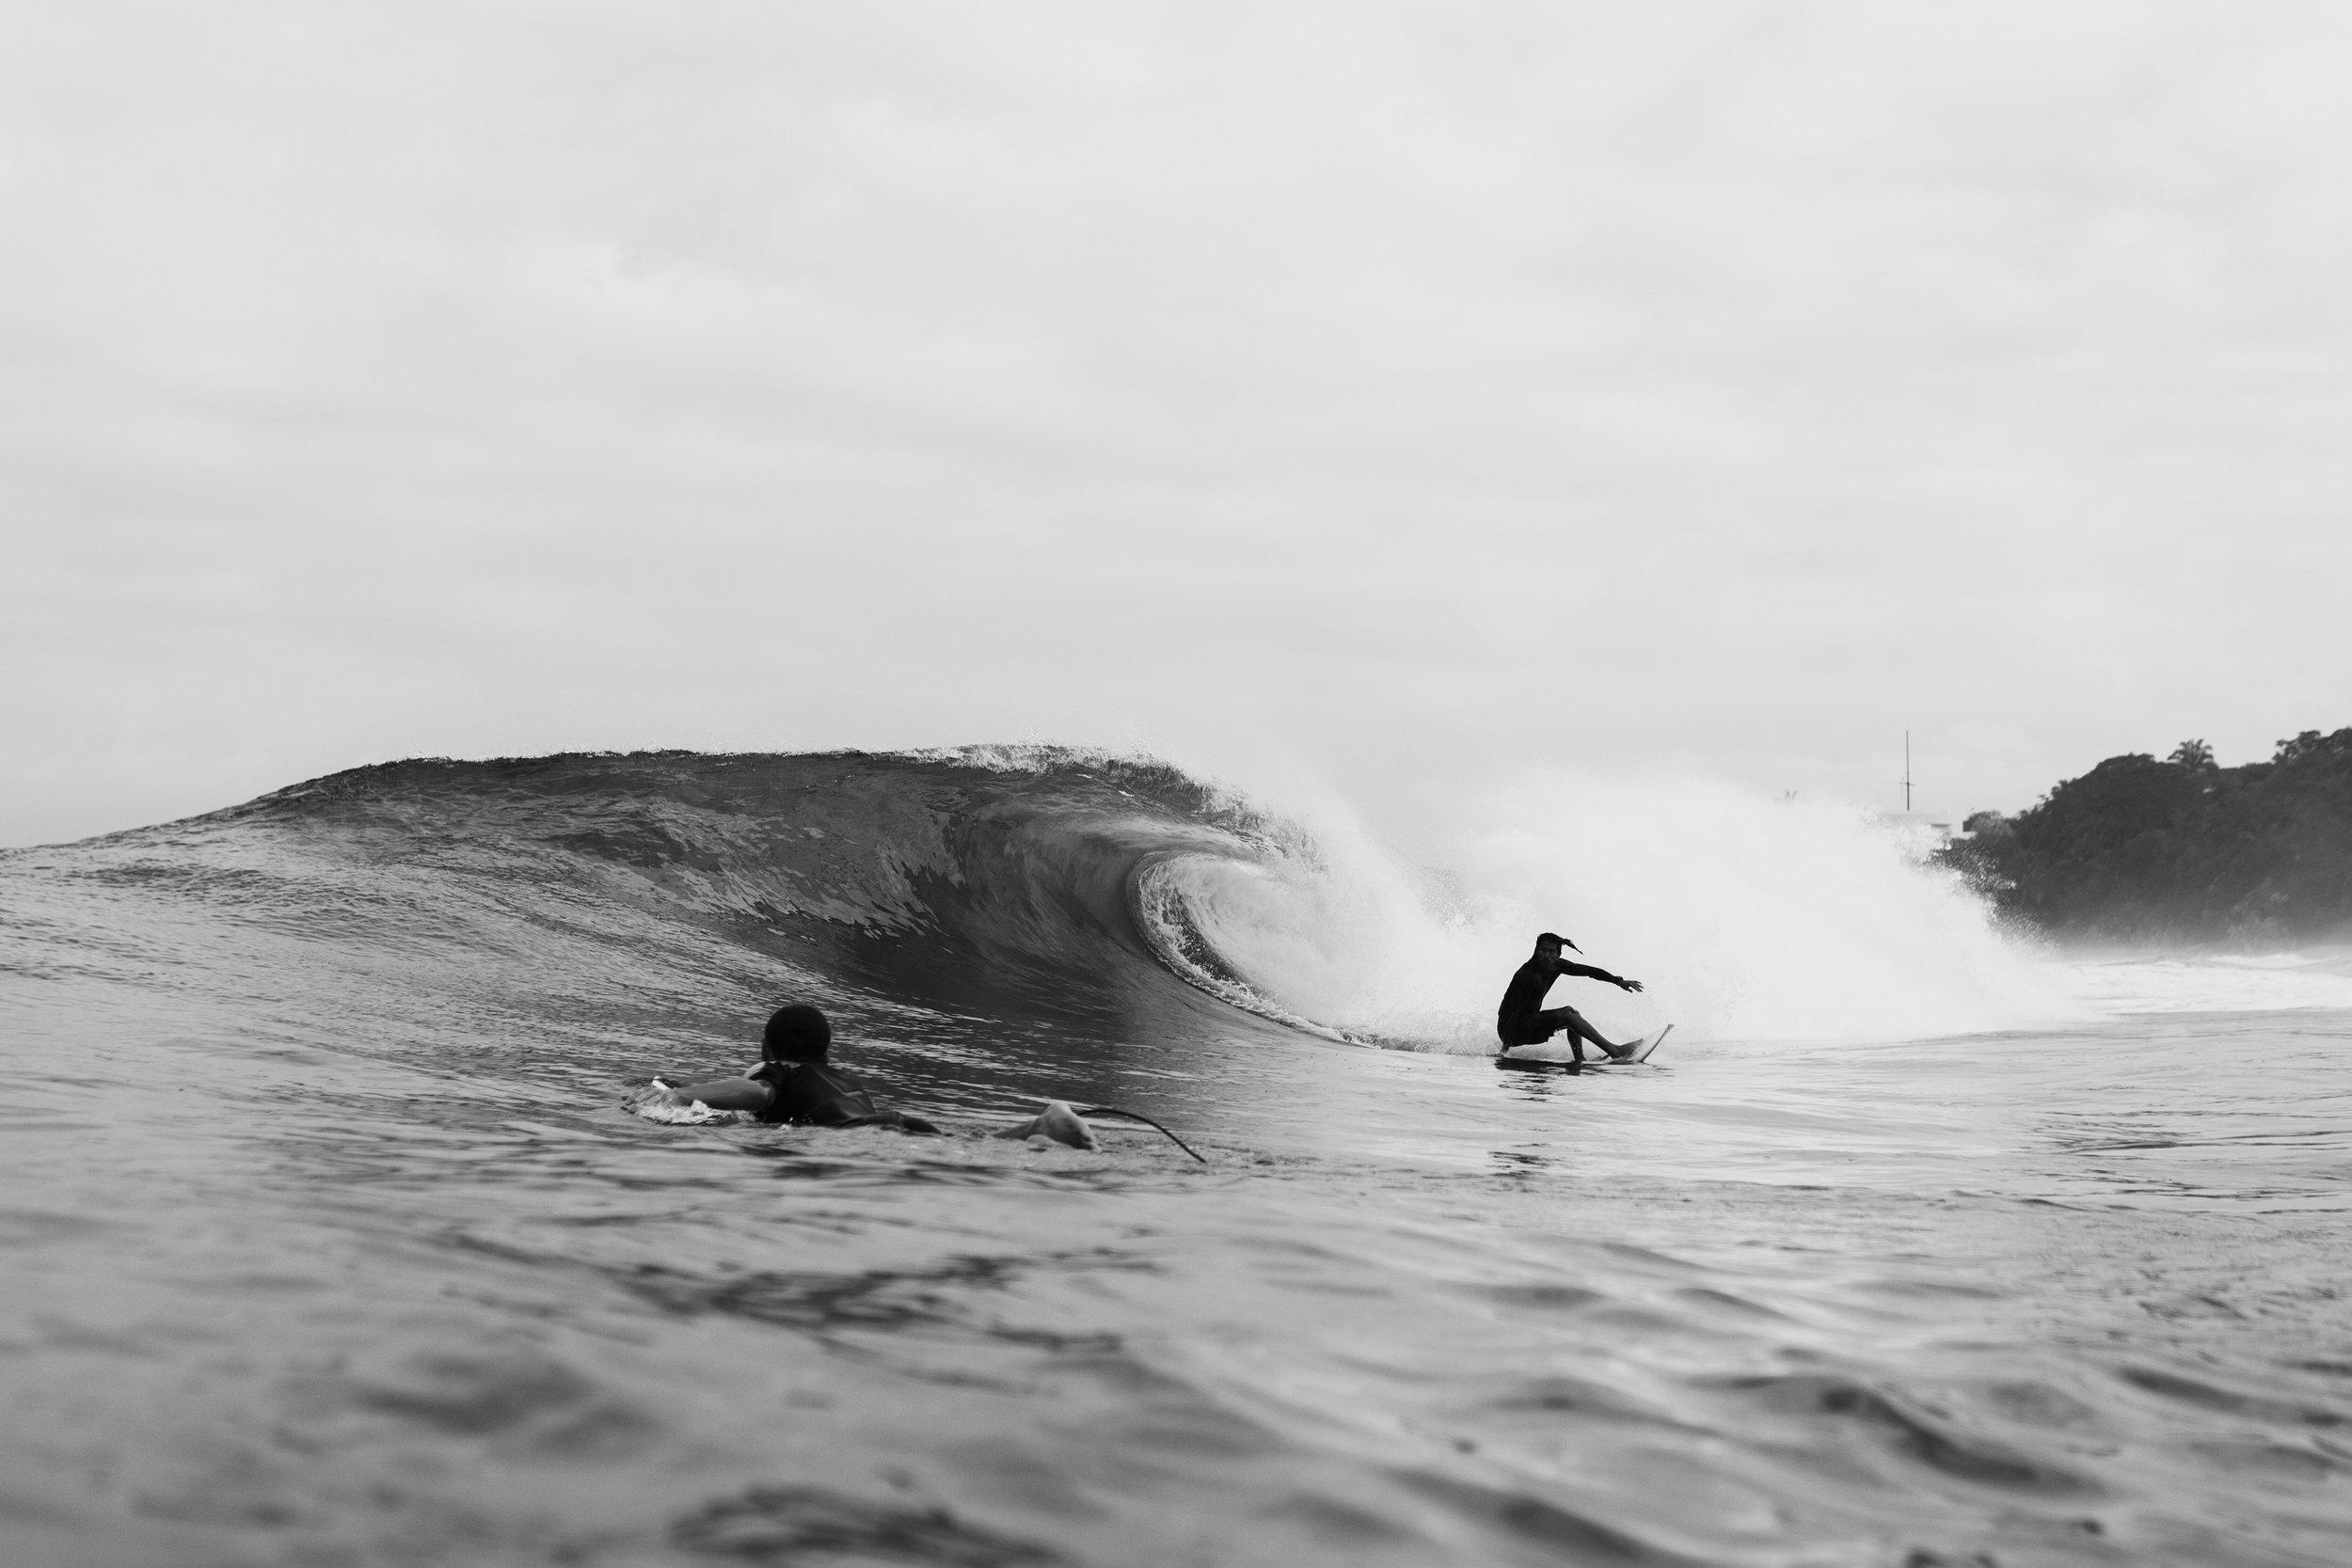 Sayulita-Mexico-Surf-Diego-Cadena-Kalle-Carranza-Dylan-Southworth-Gato-Rodriguez-Julien-Dorian-Gomez-Heiko-Bothe-10.jpg